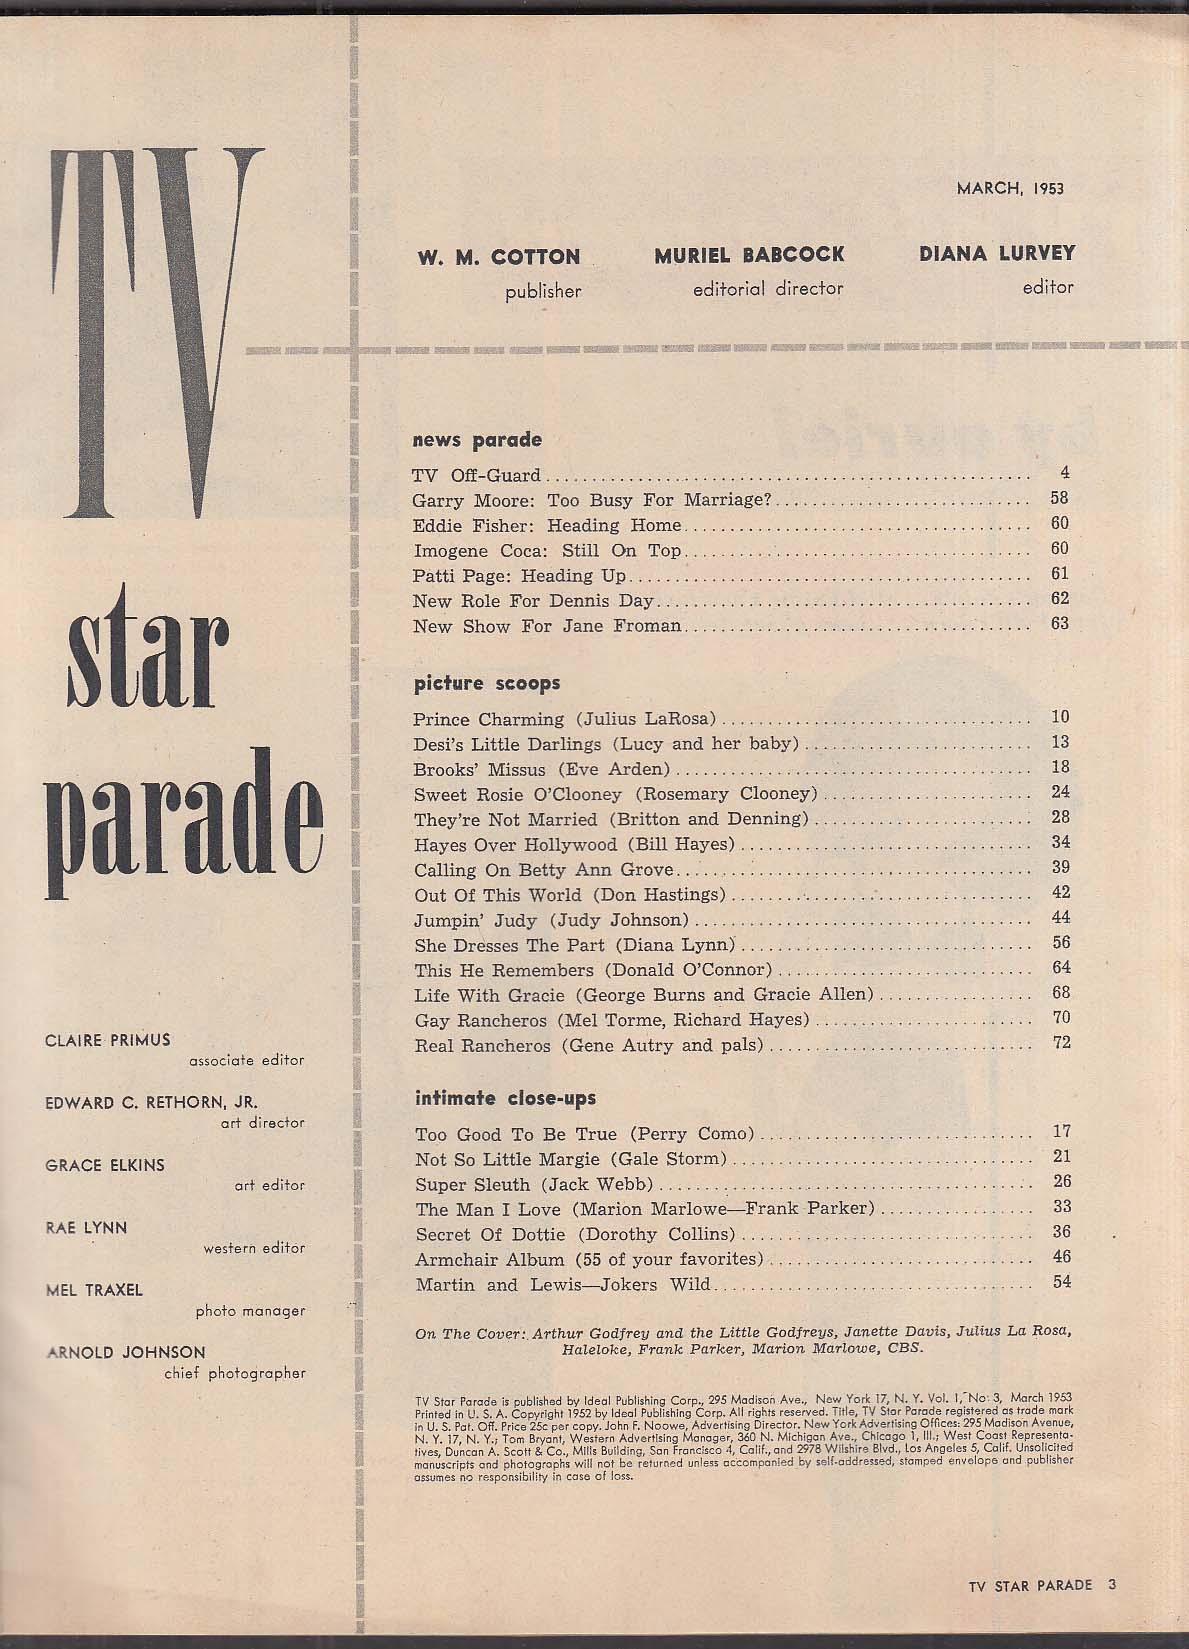 TV STAR PARADE Godfrey Como Lucy Martin & Lewis 3 1953